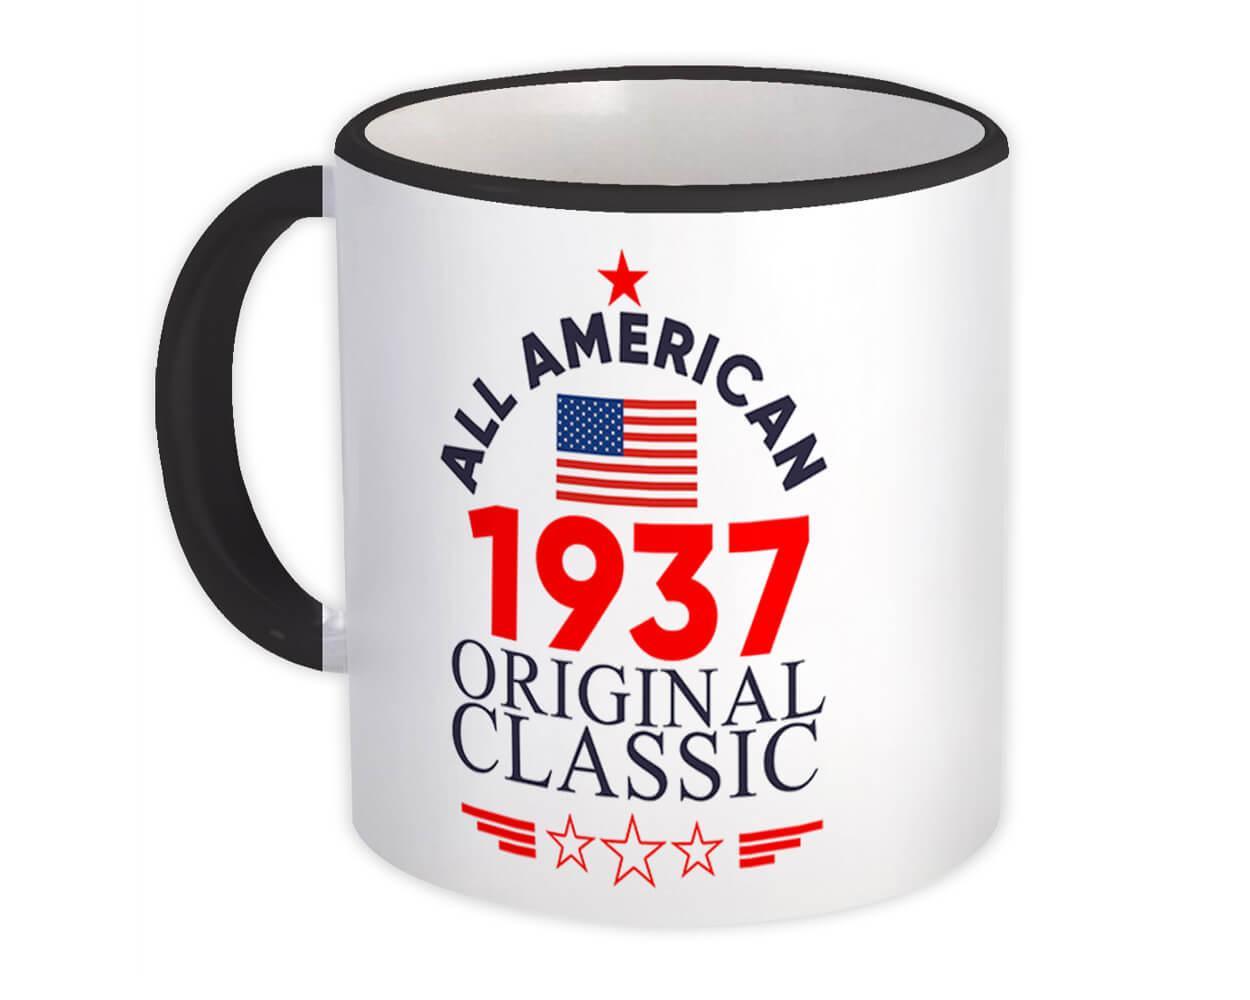 1937 Birthday : Gift Mug All American Original Classic Flag Patriotic Age USA